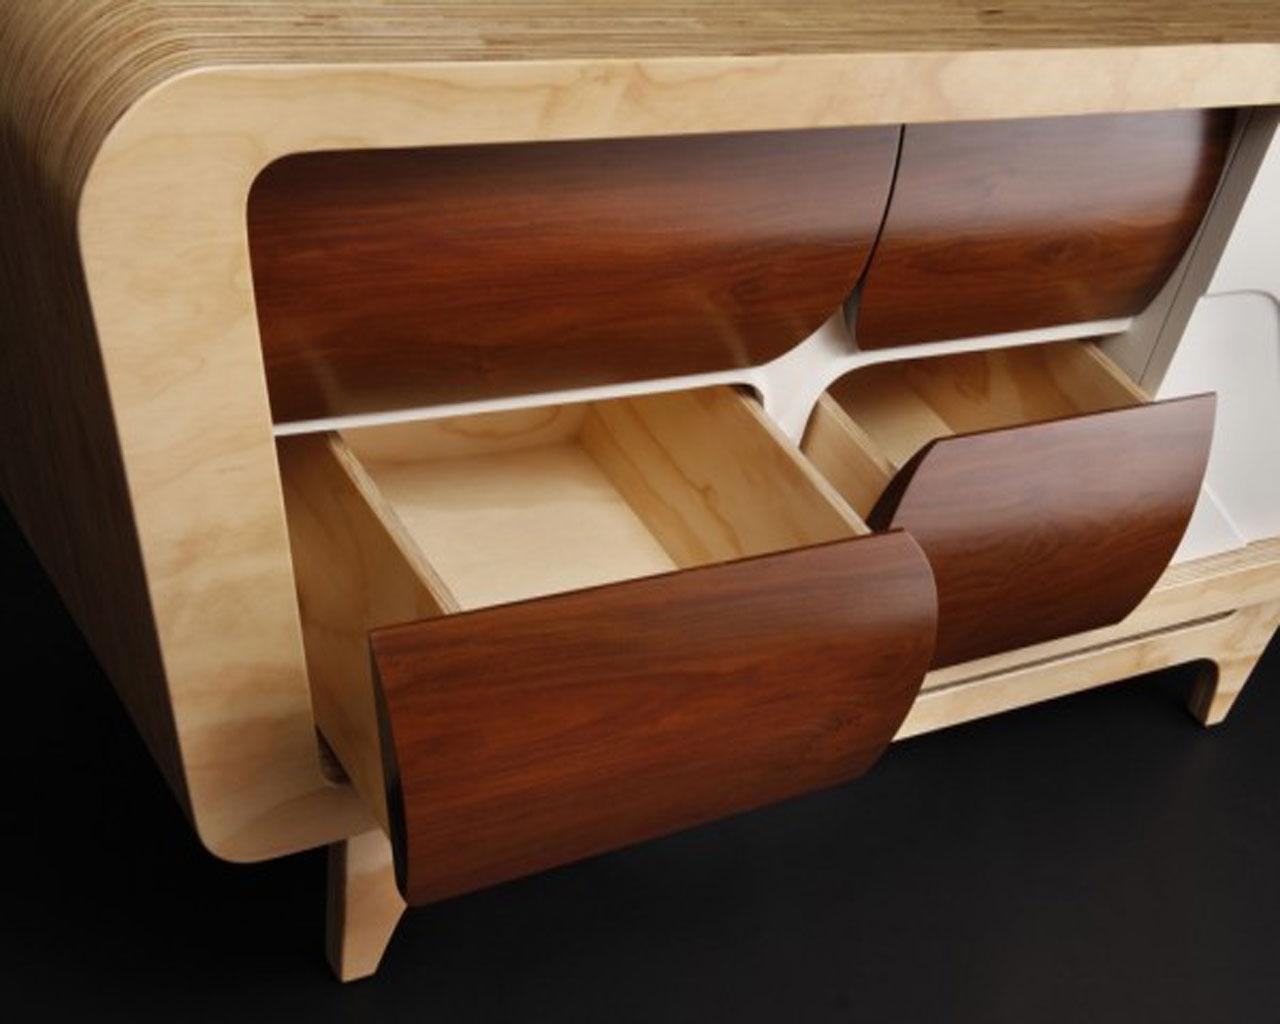 Contemporary Furniture Design 5